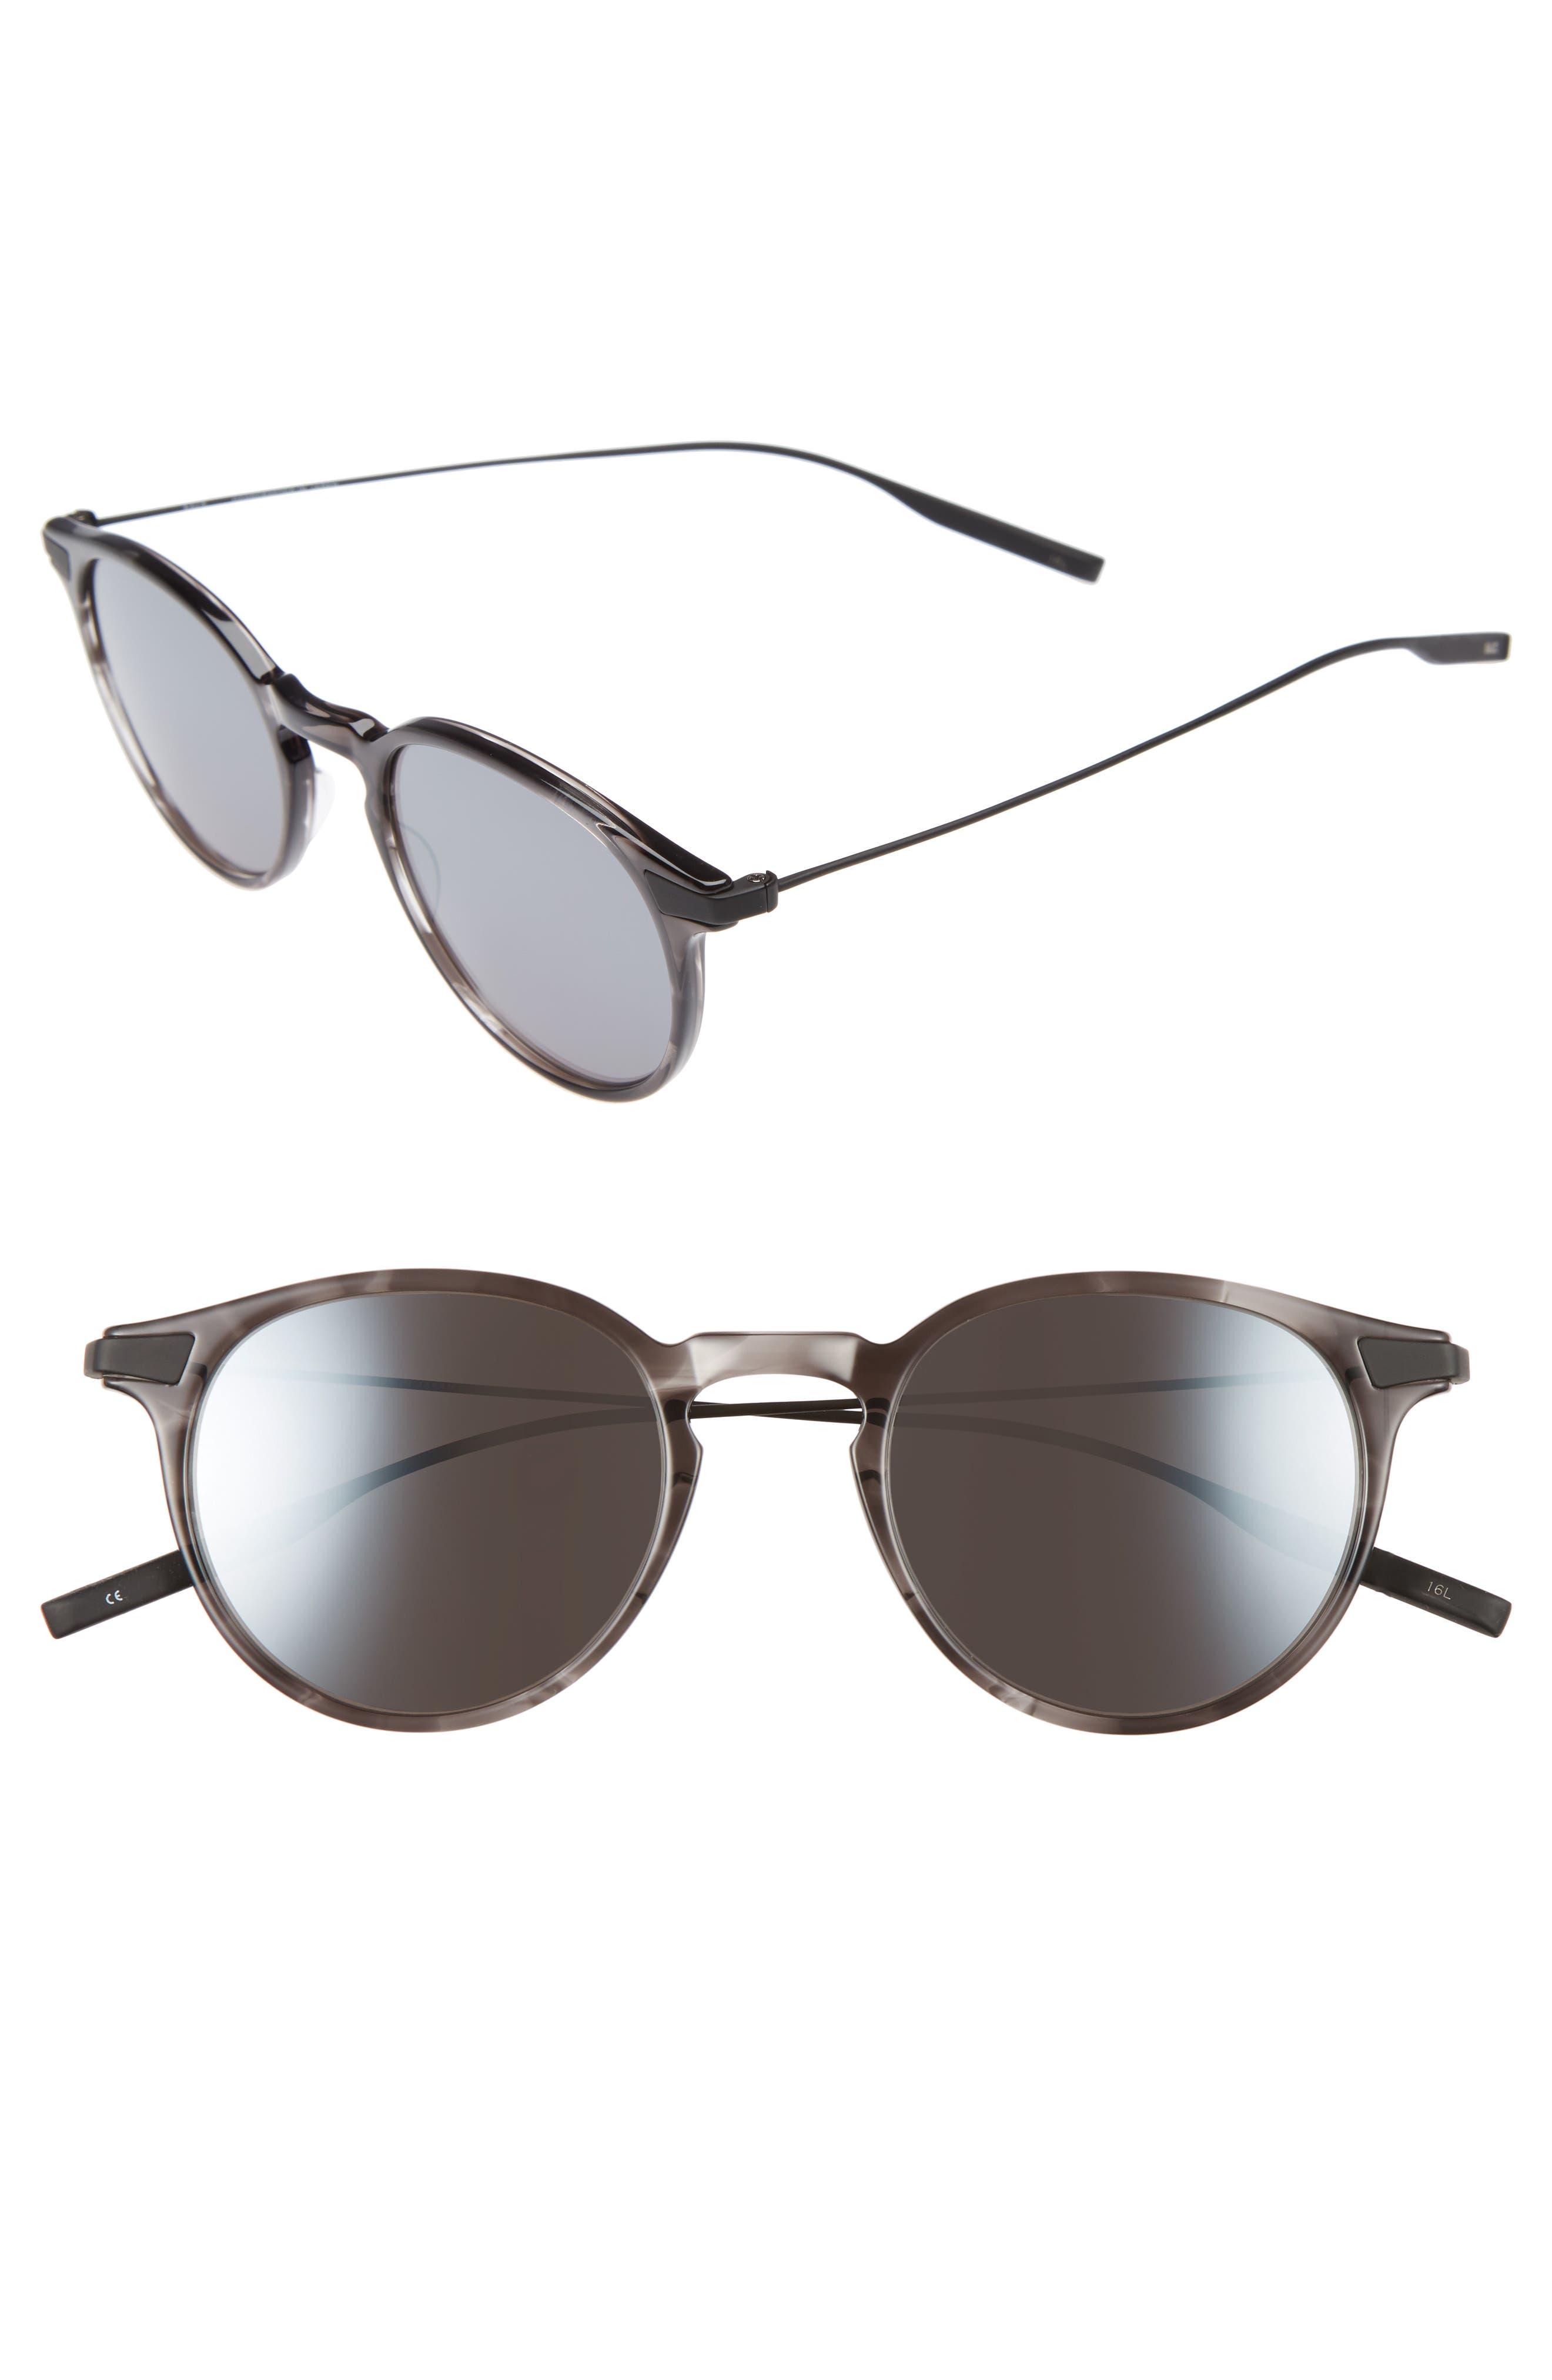 Rick 48mm Polarized Round Sunglasses,                             Main thumbnail 1, color,                             020